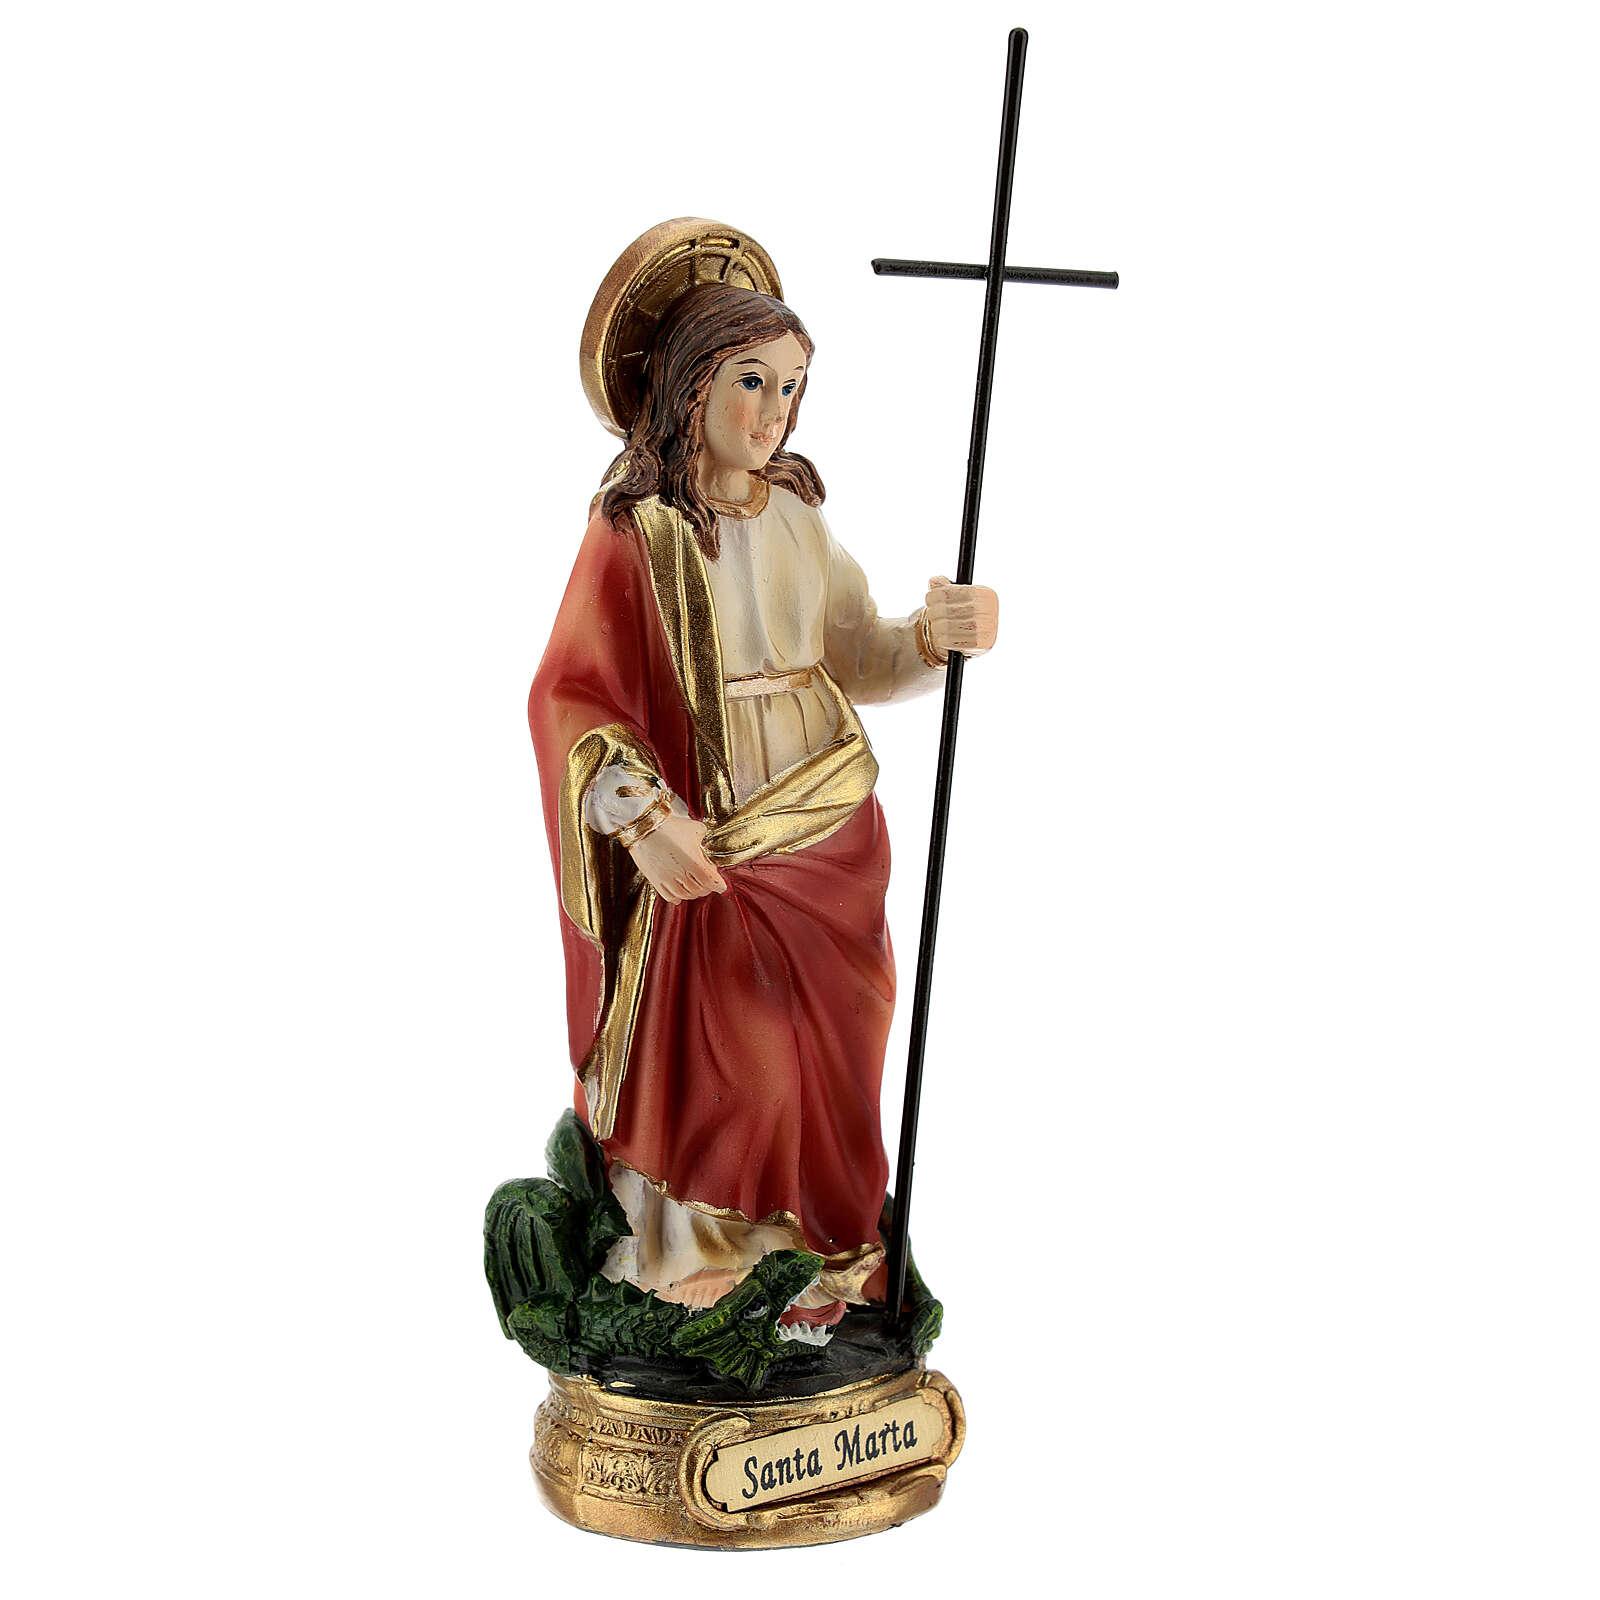 Santa Marta vence a Tarasca estatua resina 12 cm 4